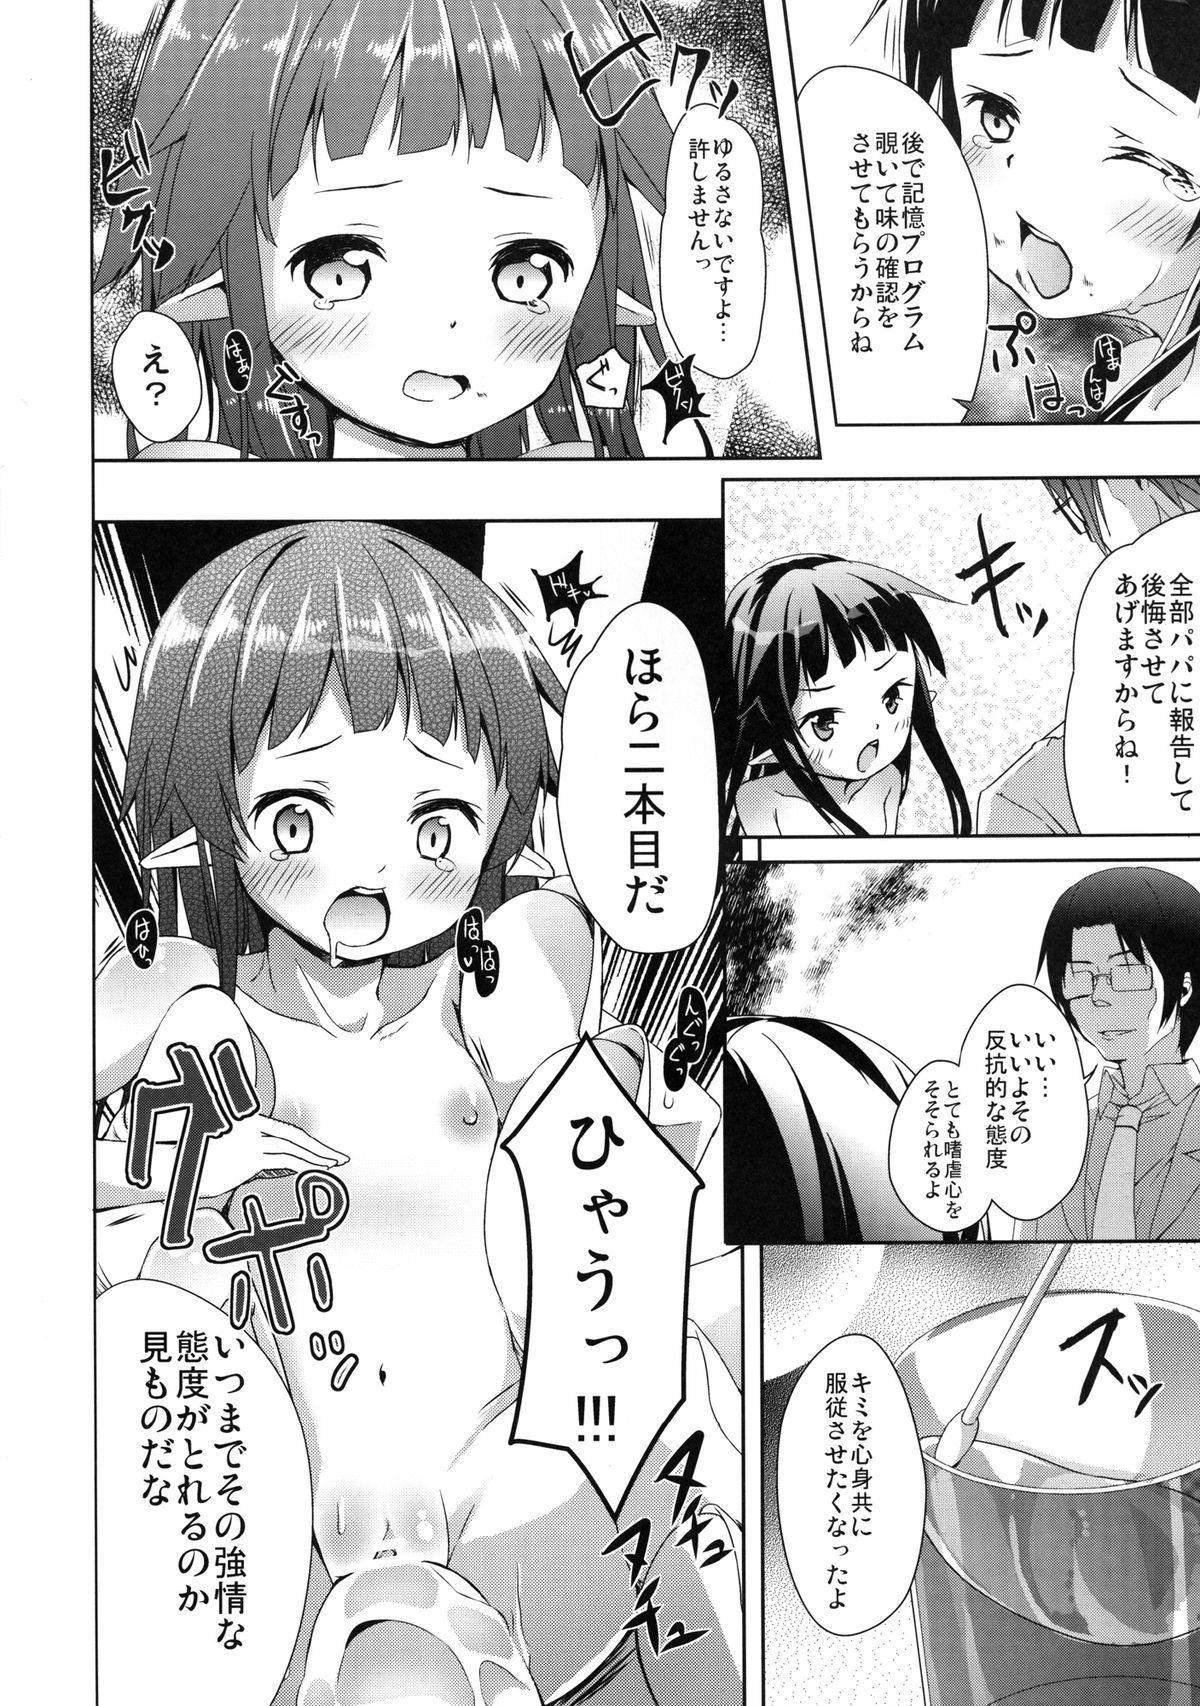 Yui-chan BOKOO! 9